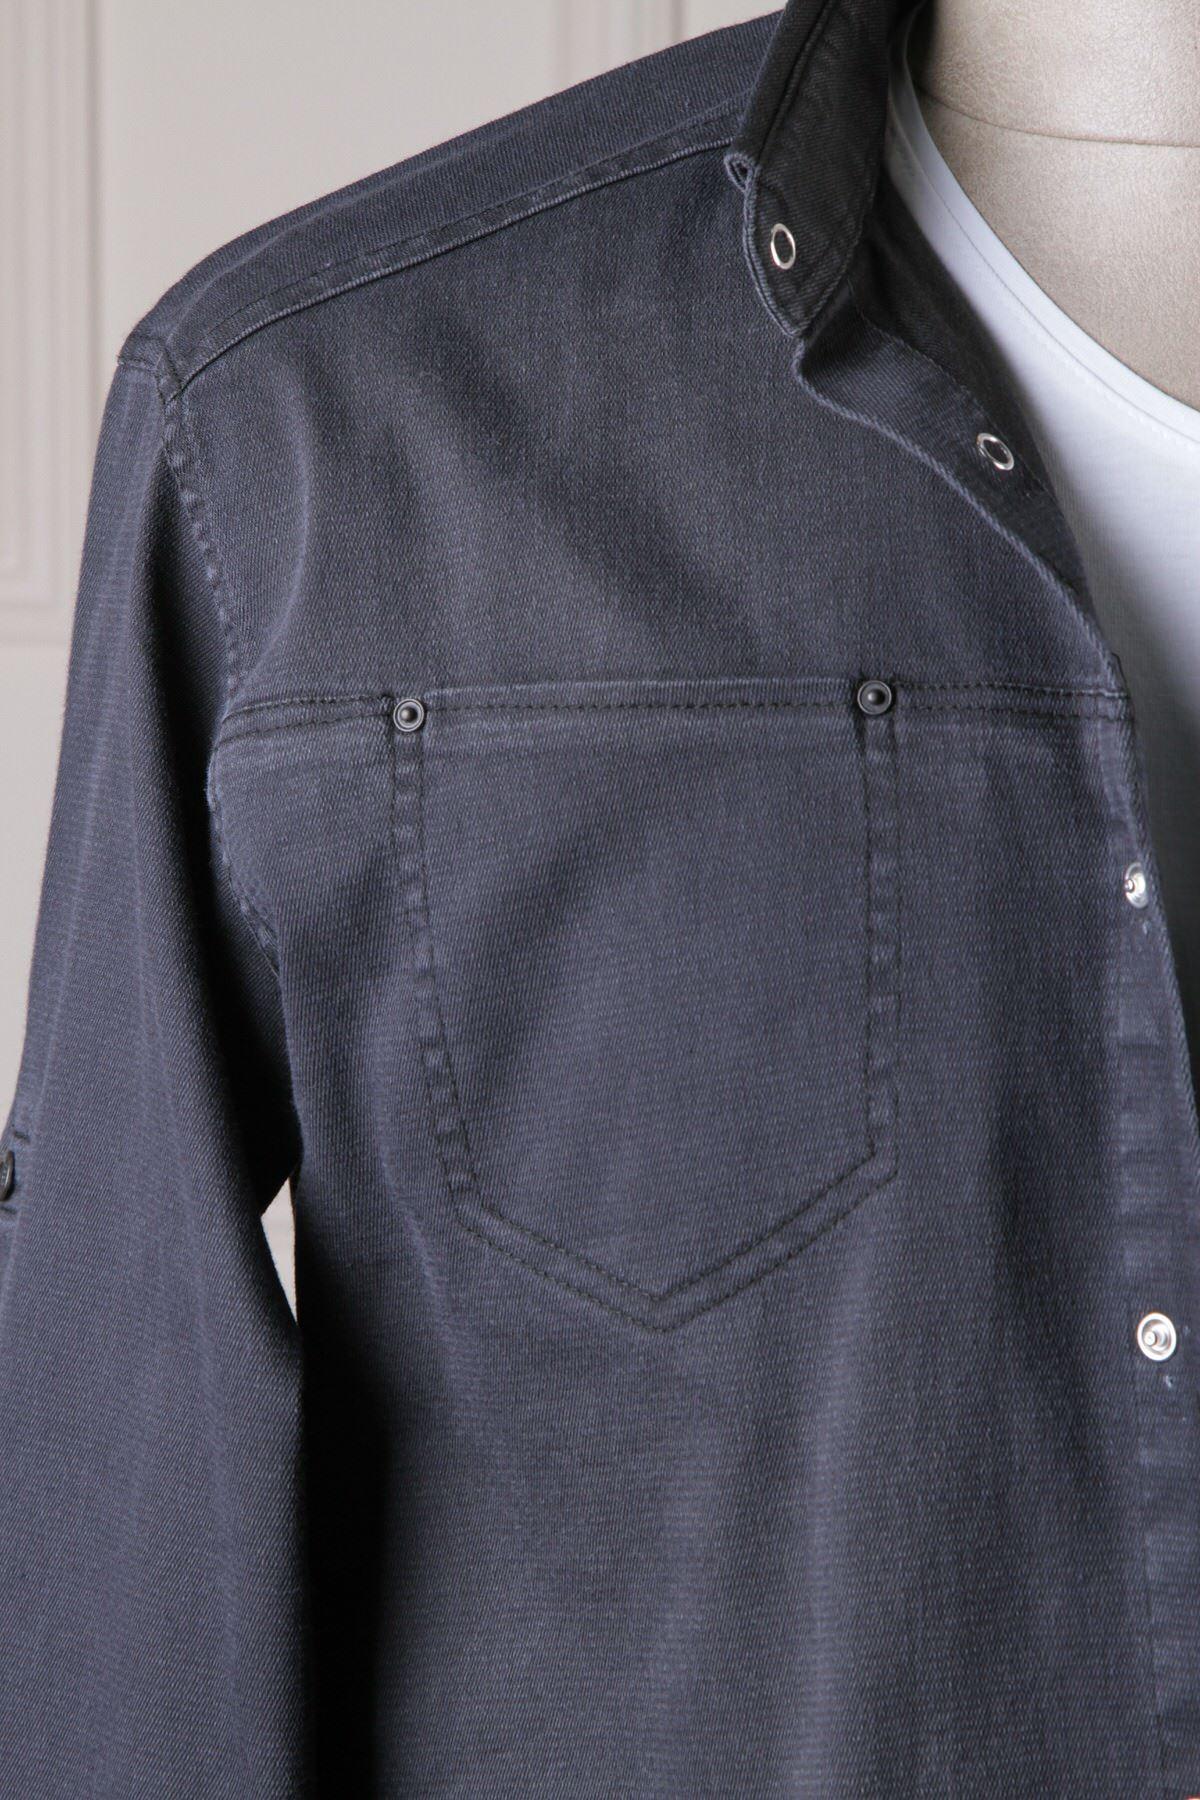 Erkek Örme Kot Gömlek - Siyah